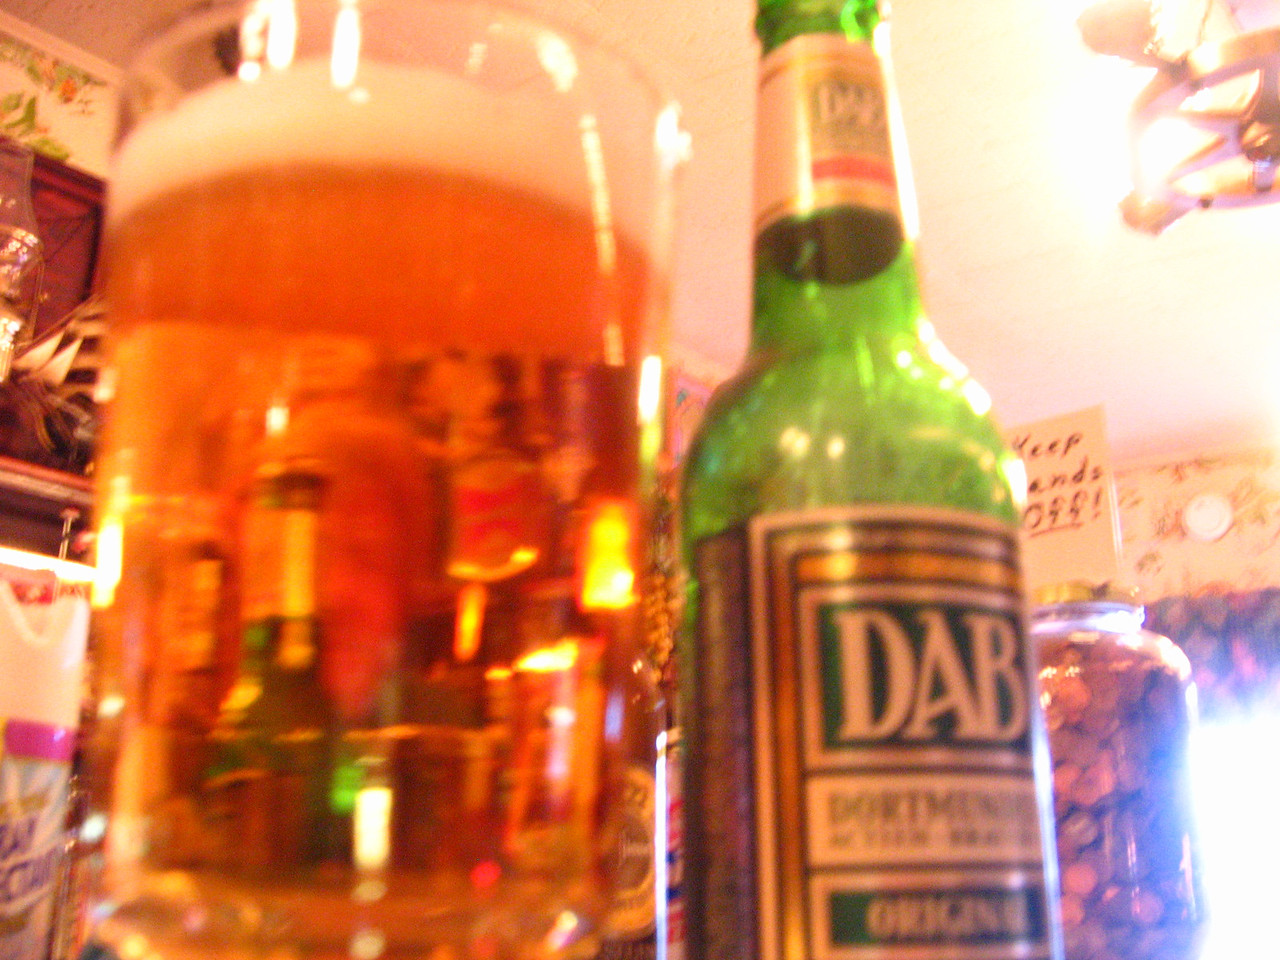 Next stop, Eppler's roadside tavern, home of DAB beer.